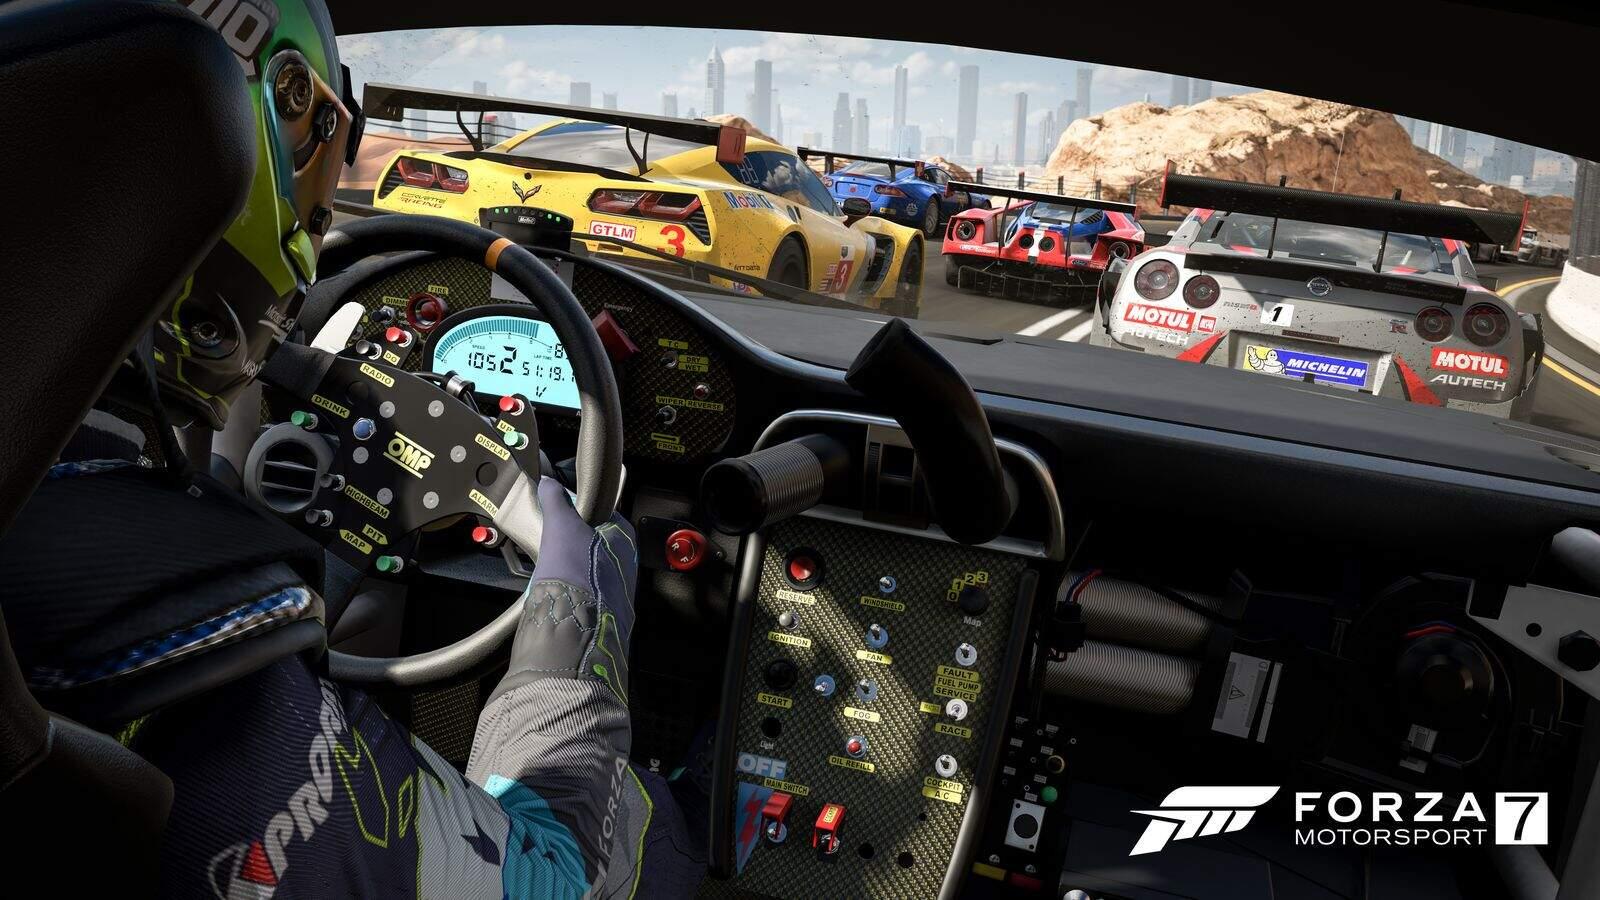 Forza Motorsport 7 Cockpit